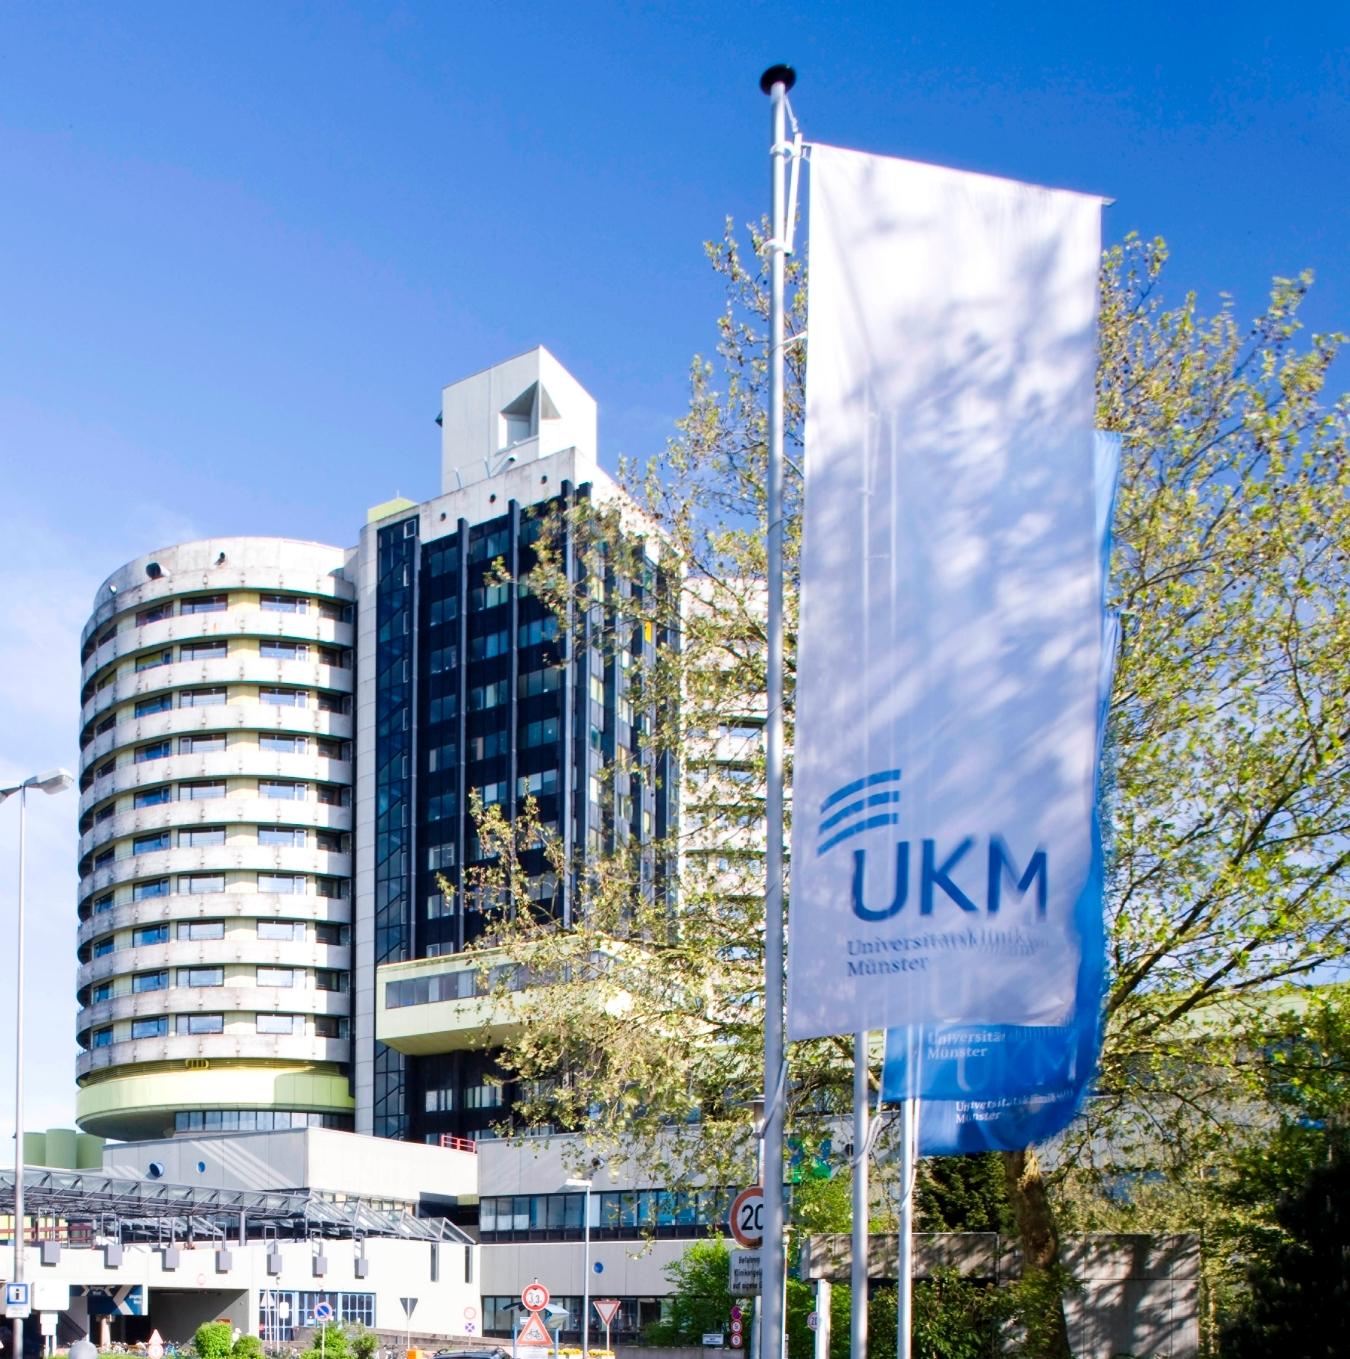 Uni Klinik Münster